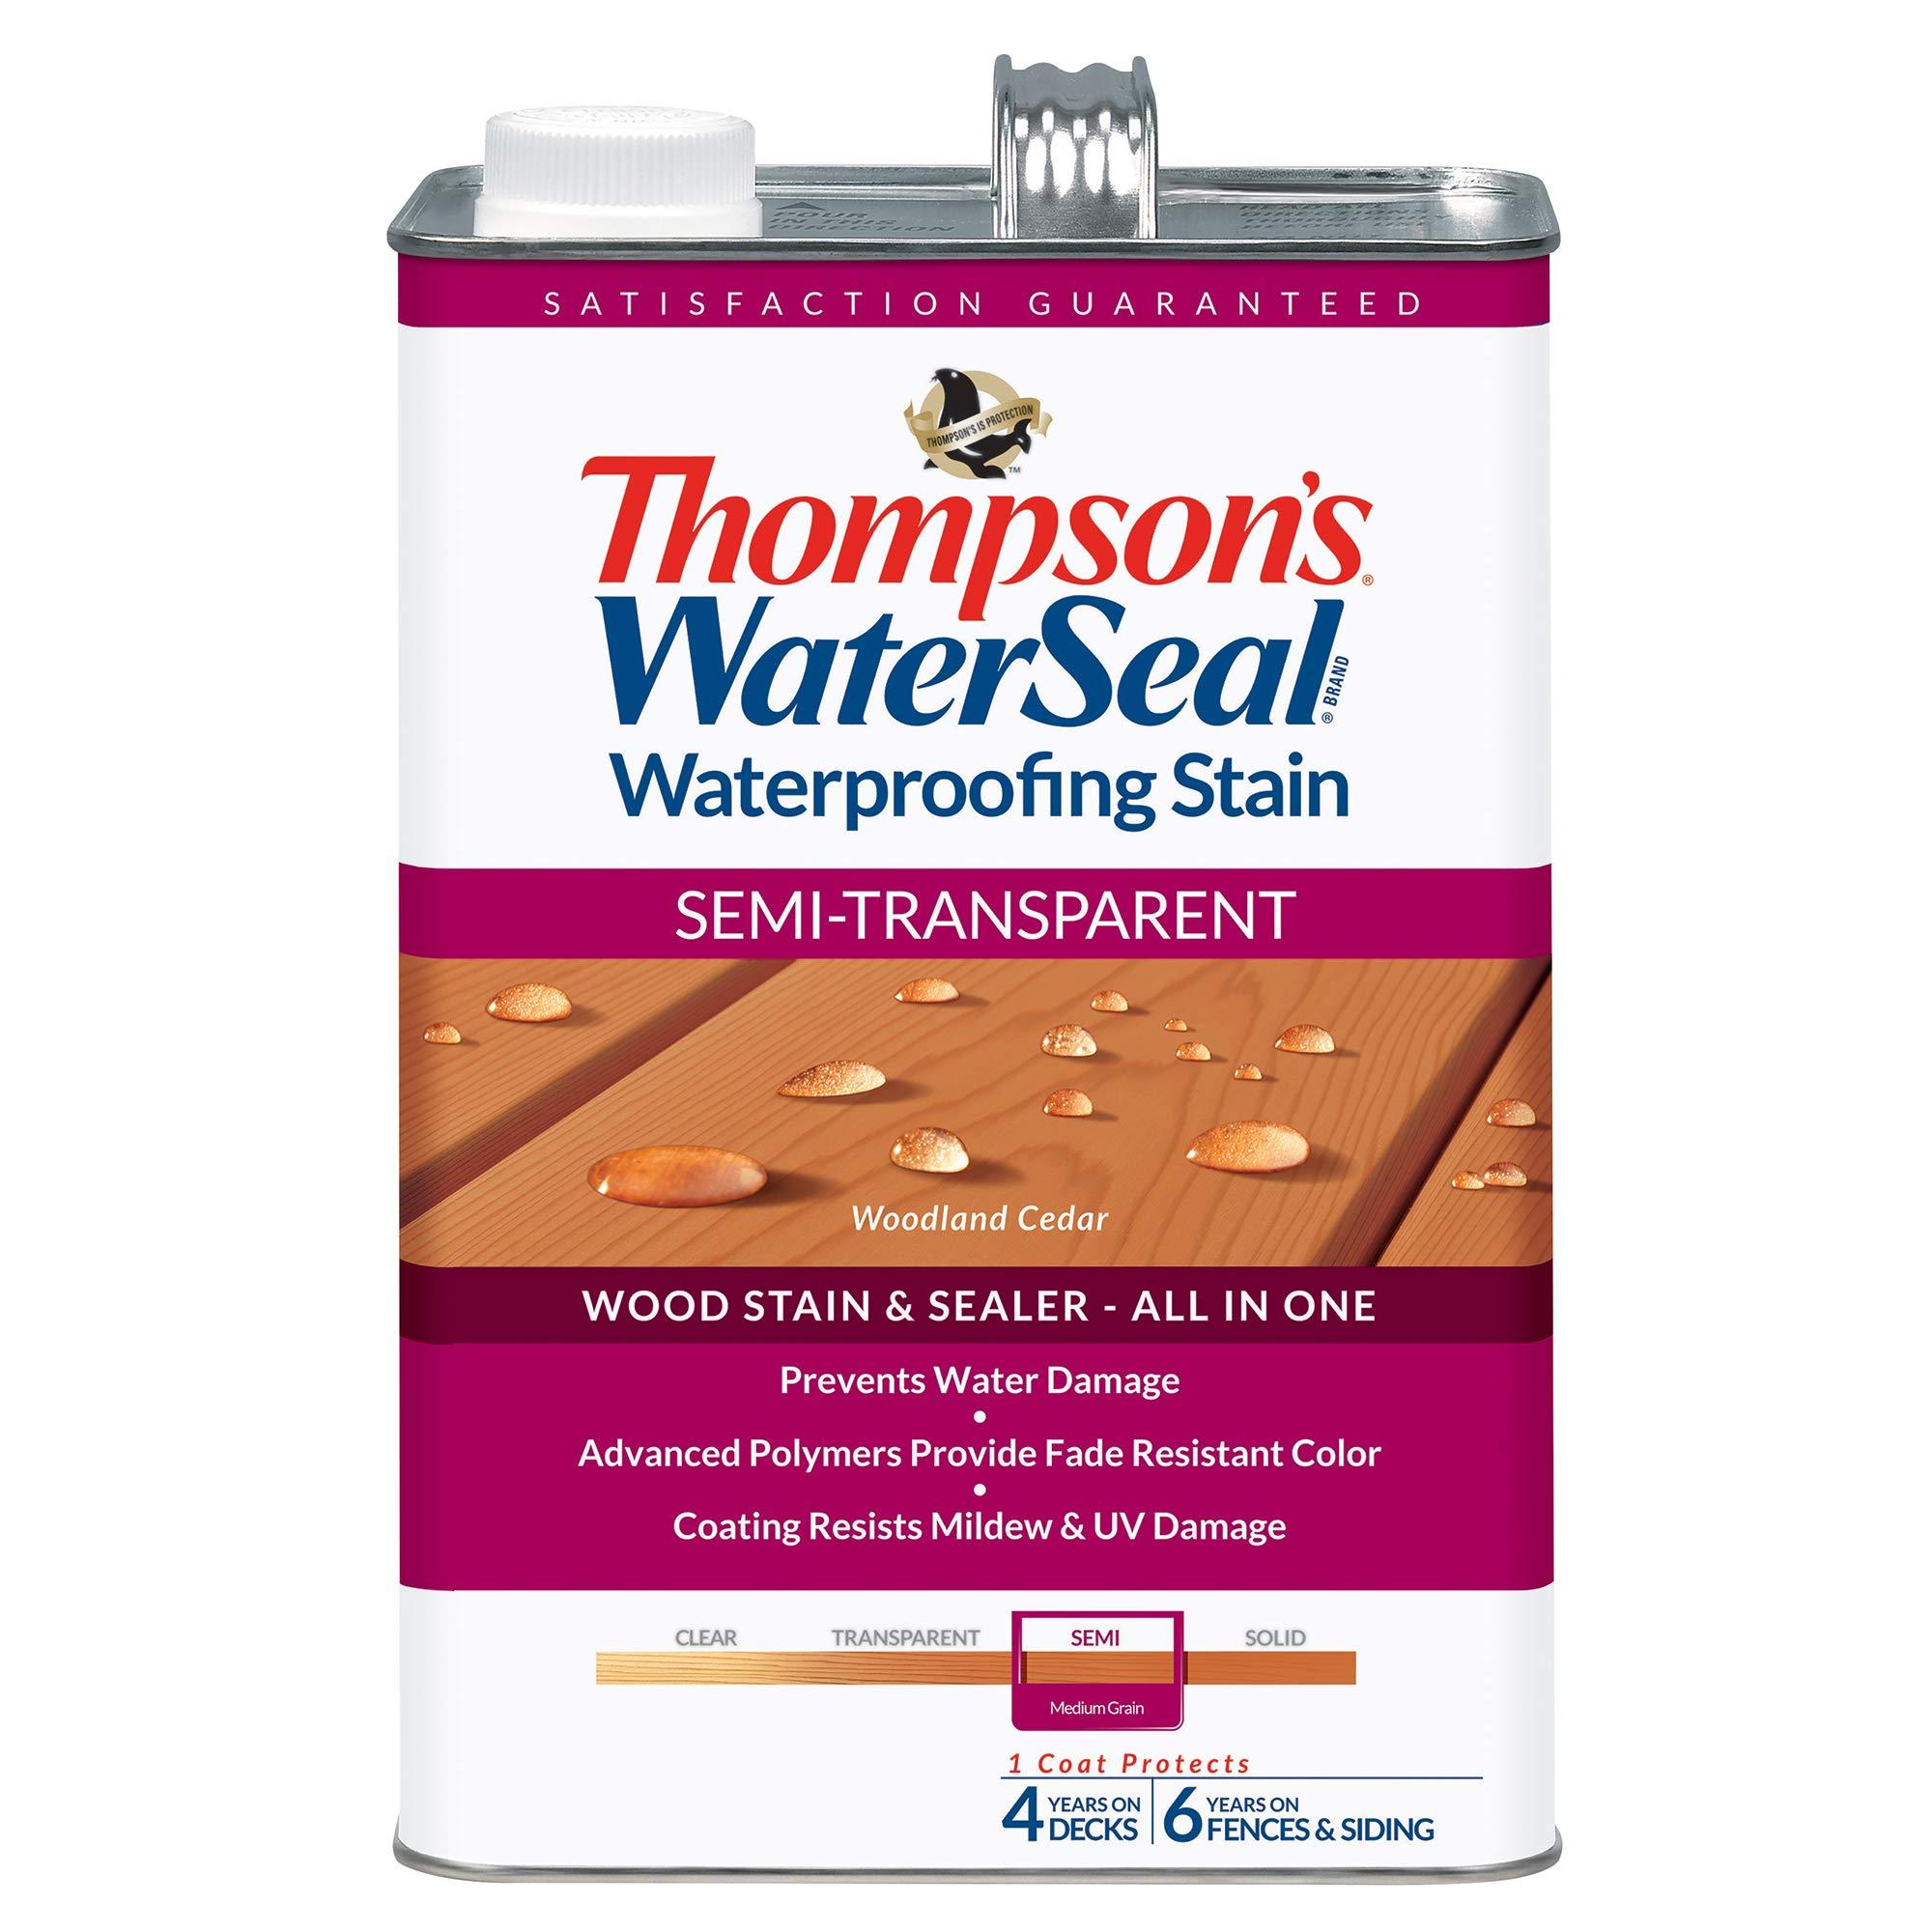 THOMPSONS WATERSEAL 042851 16 Transparent Medium